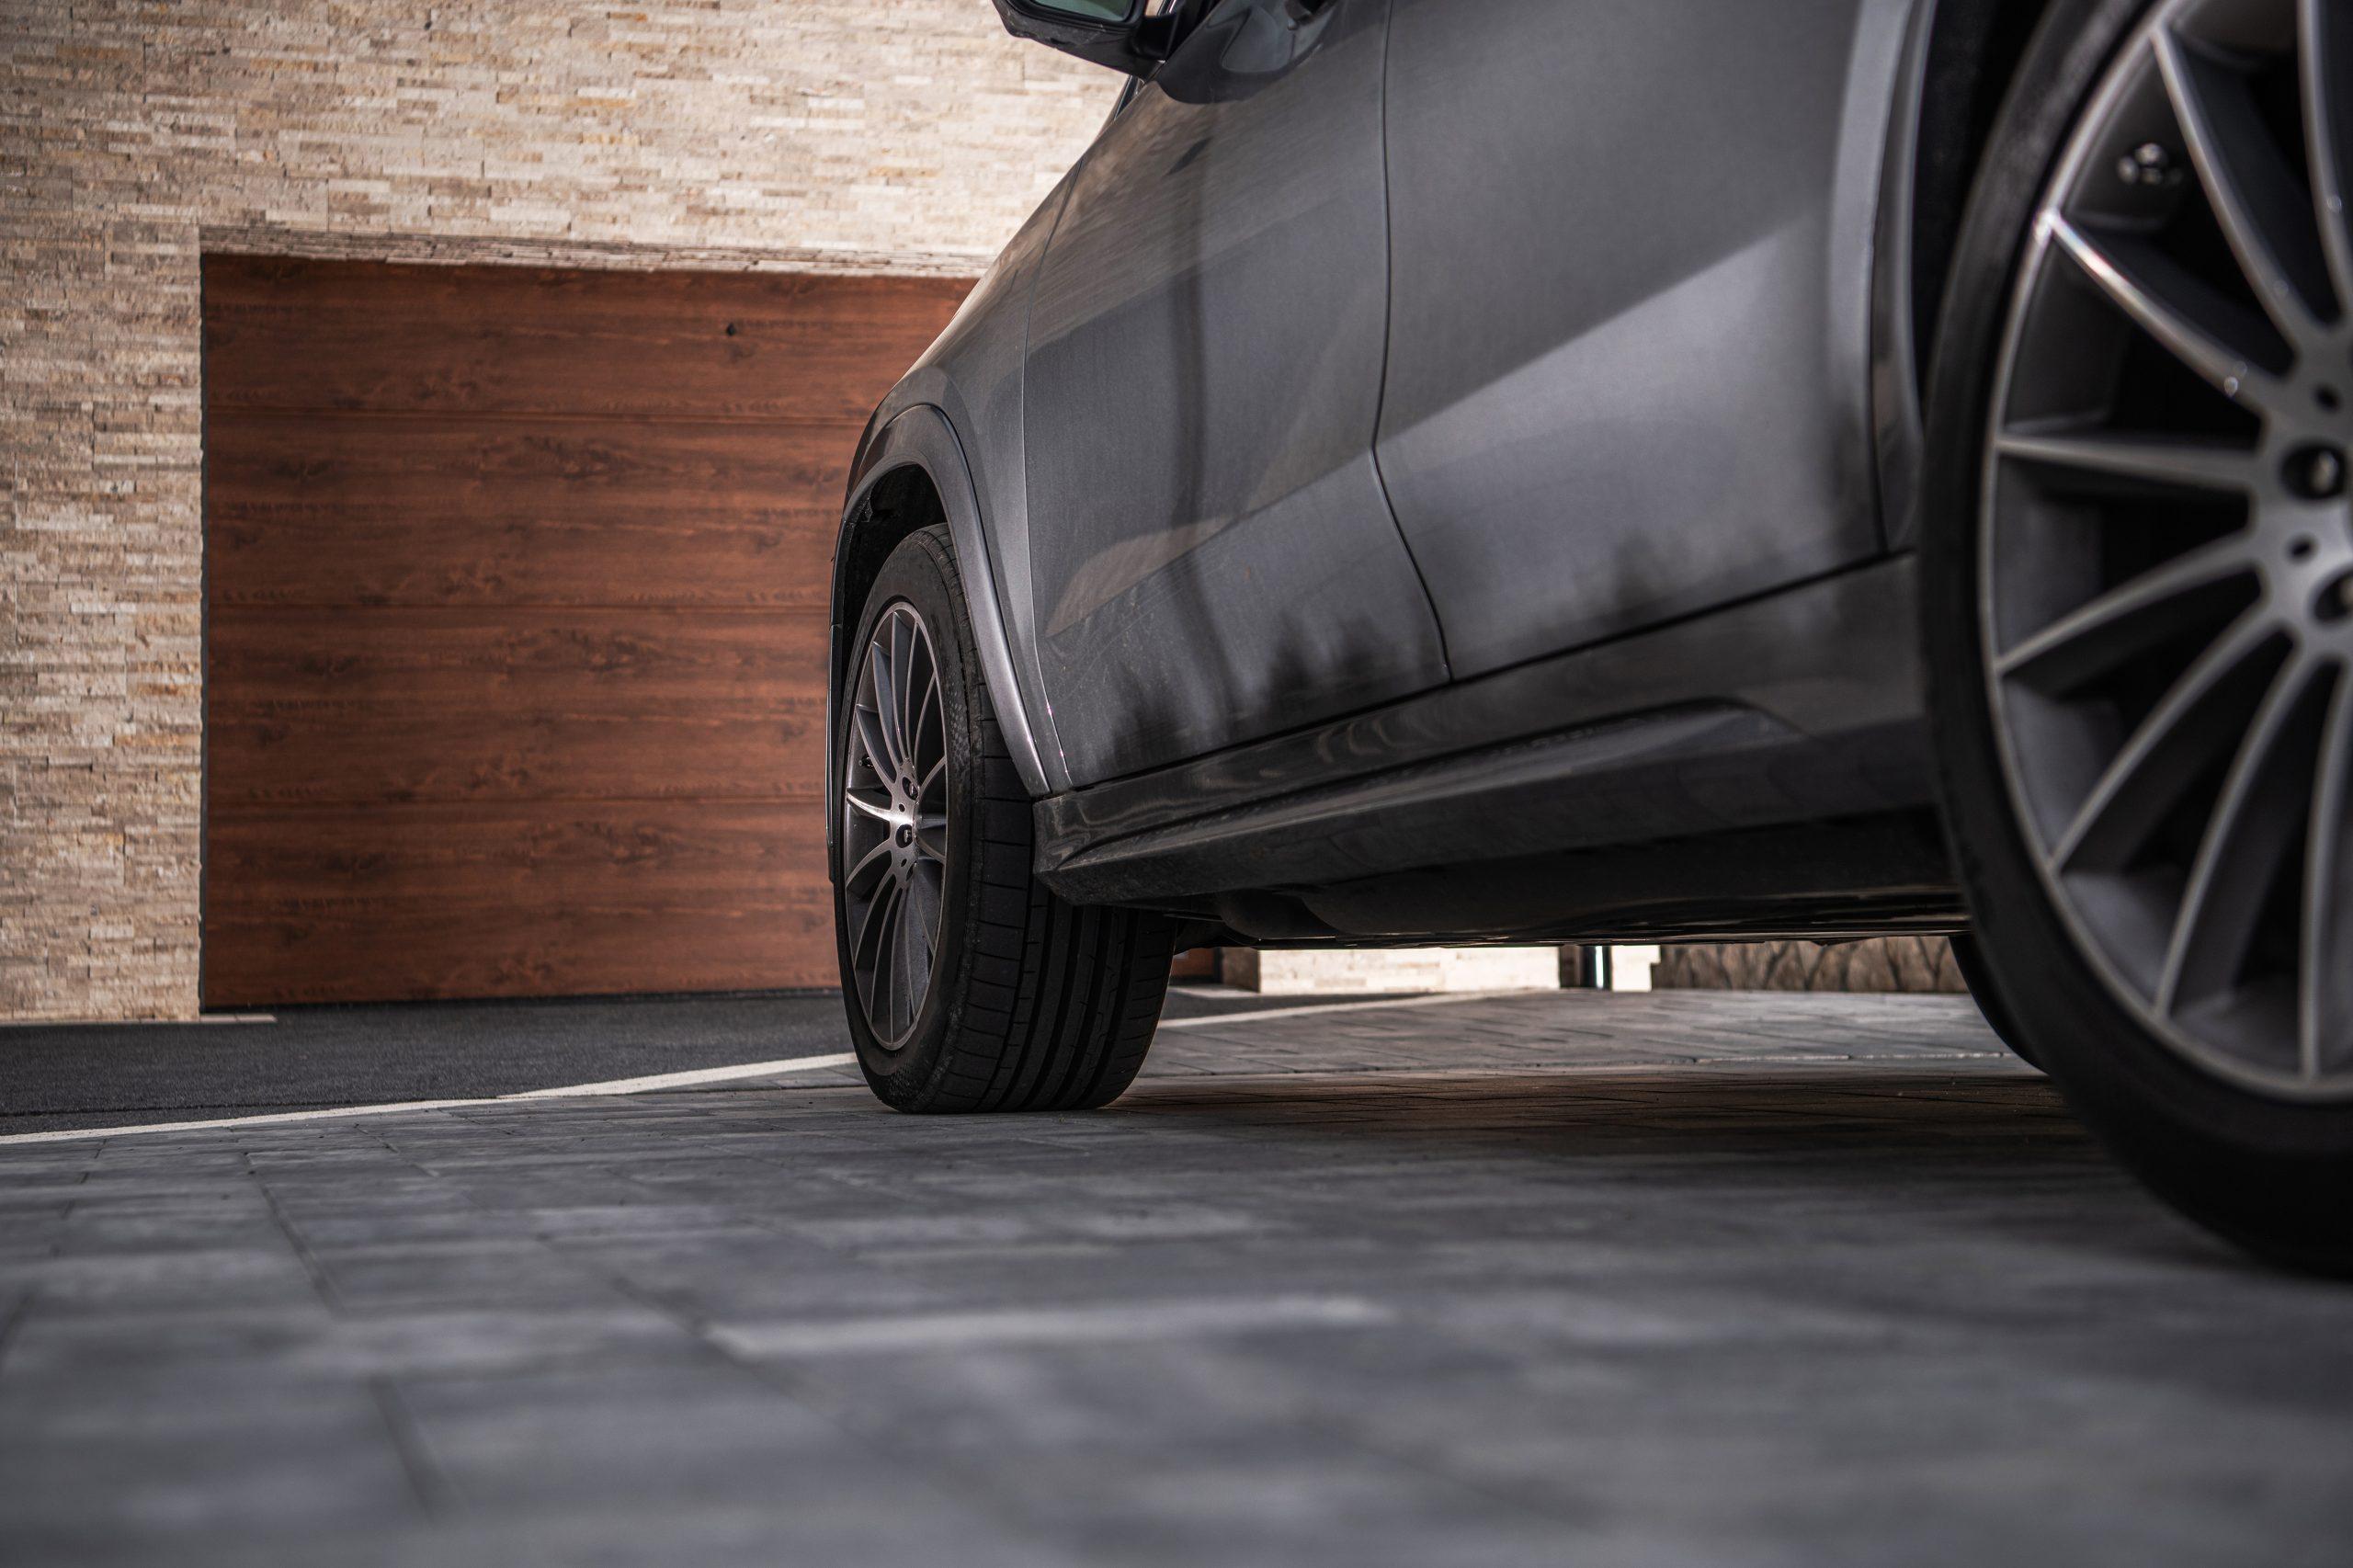 Is concrete or asphalt better for a driveway?